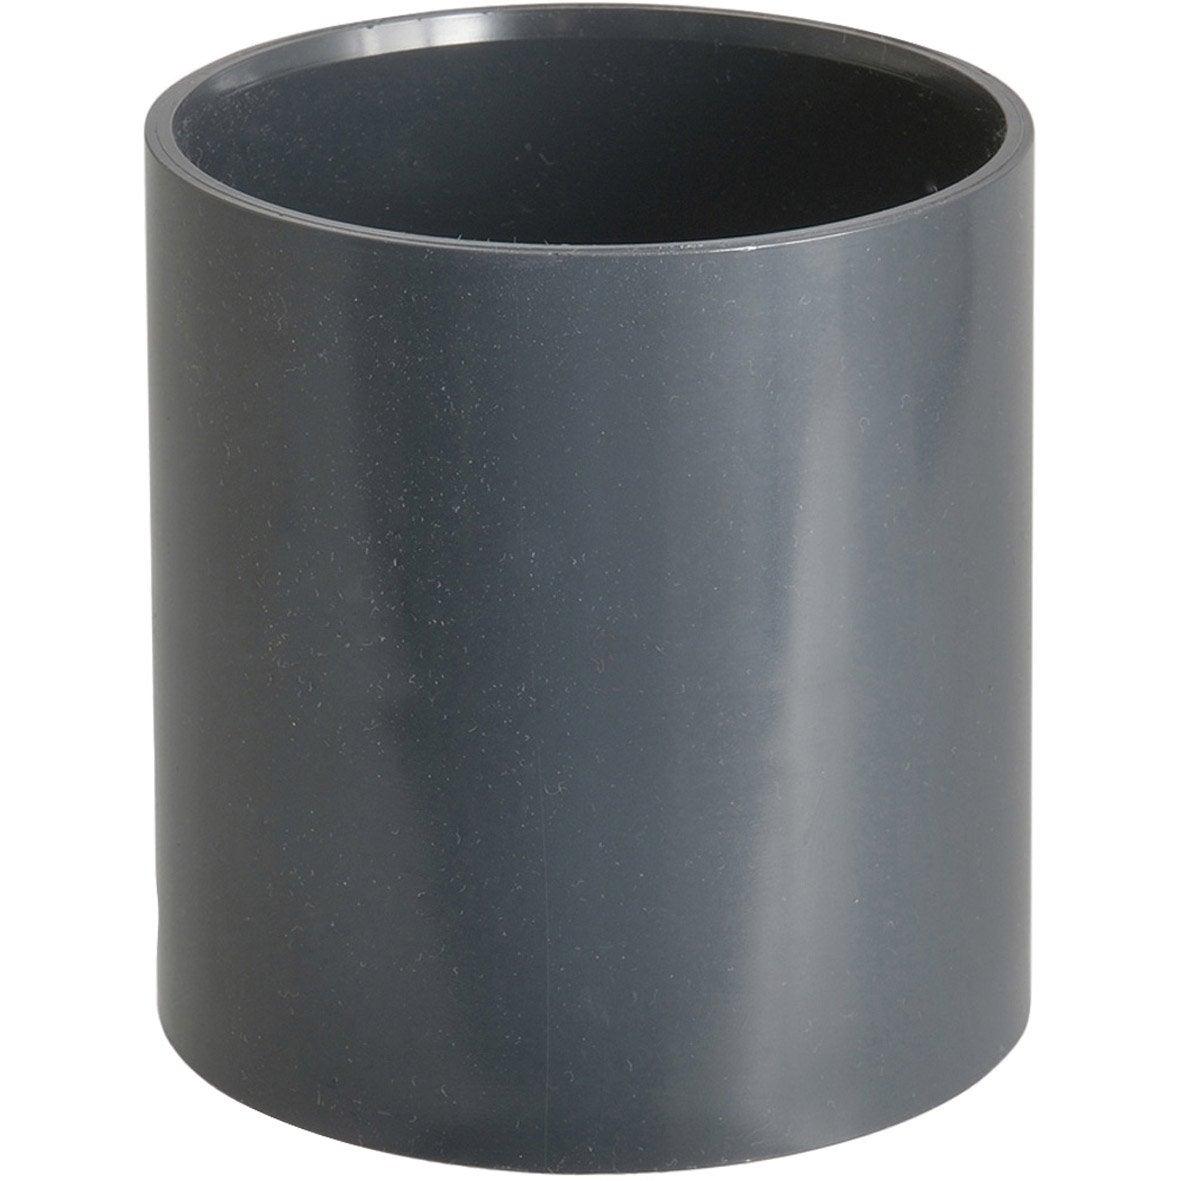 diametre tuyau pvc pas cher avec leroy merlin brico depot. Black Bedroom Furniture Sets. Home Design Ideas